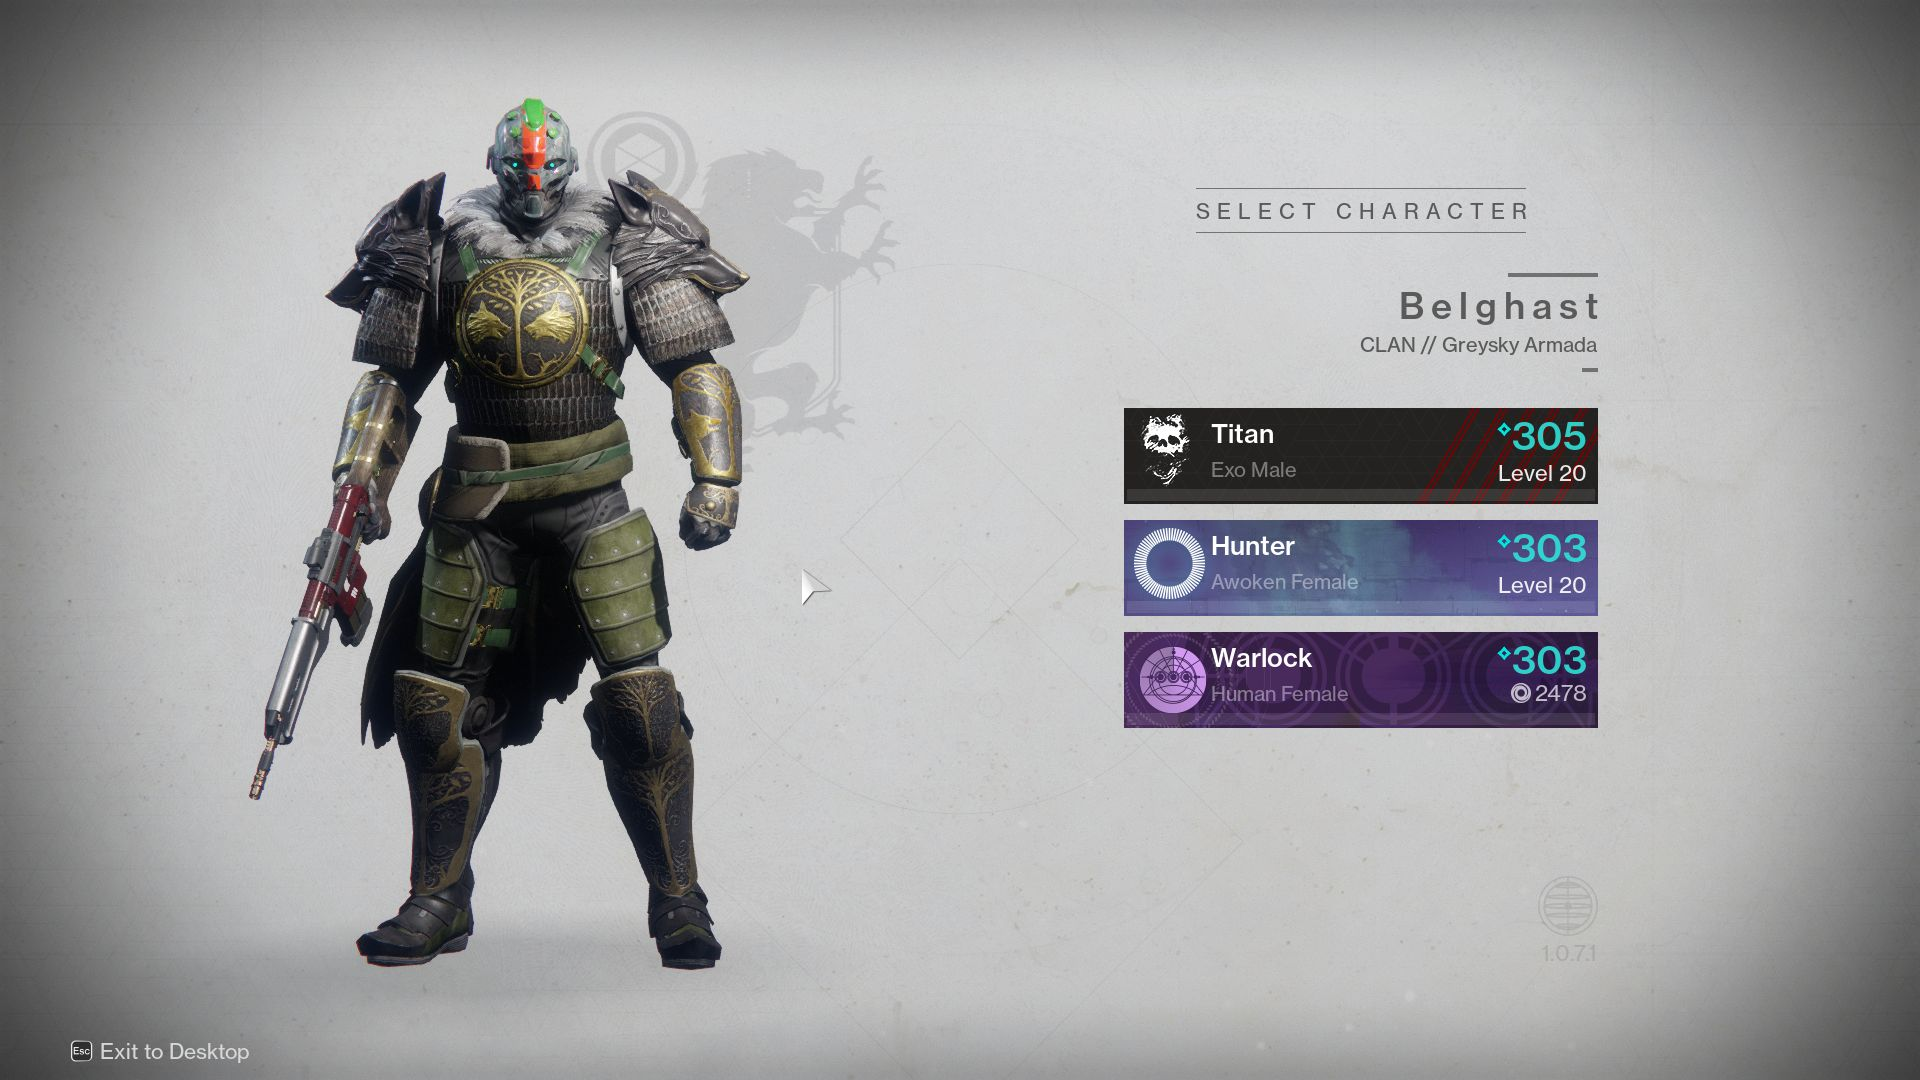 destiny-2-screenshot-2017-11-28-06-09-27-03